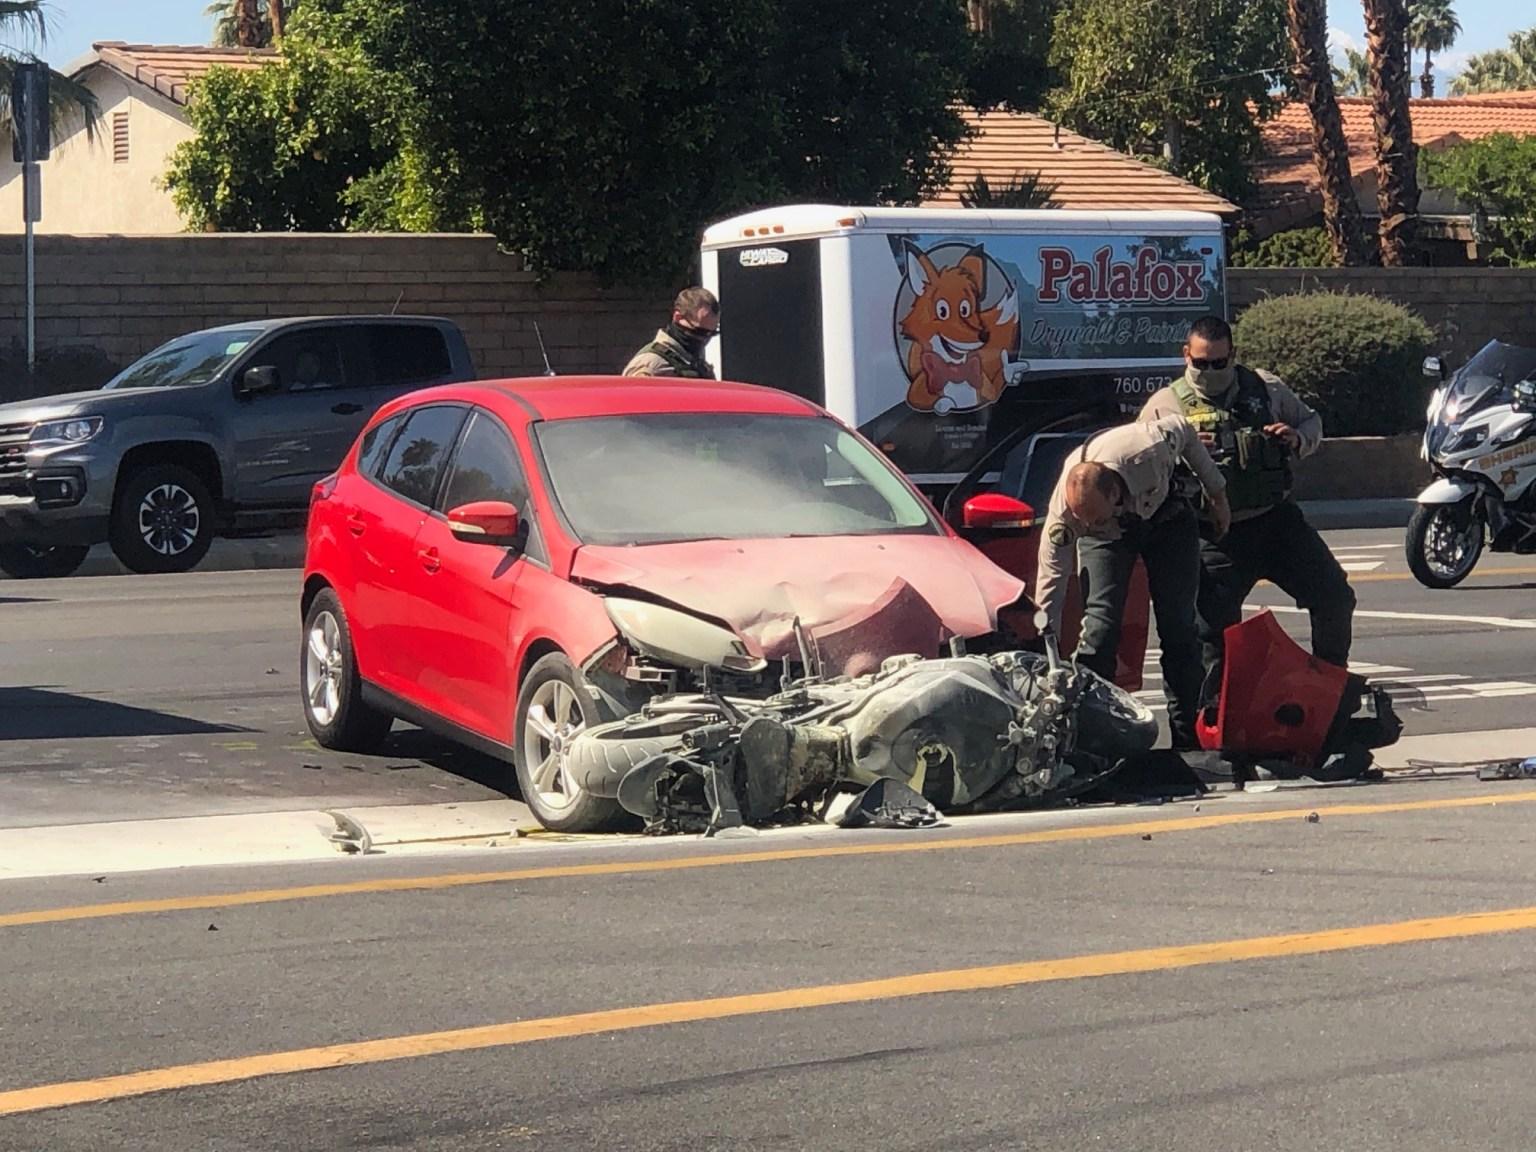 Palm Desert Collision Sends Motorcyclist to Hospital